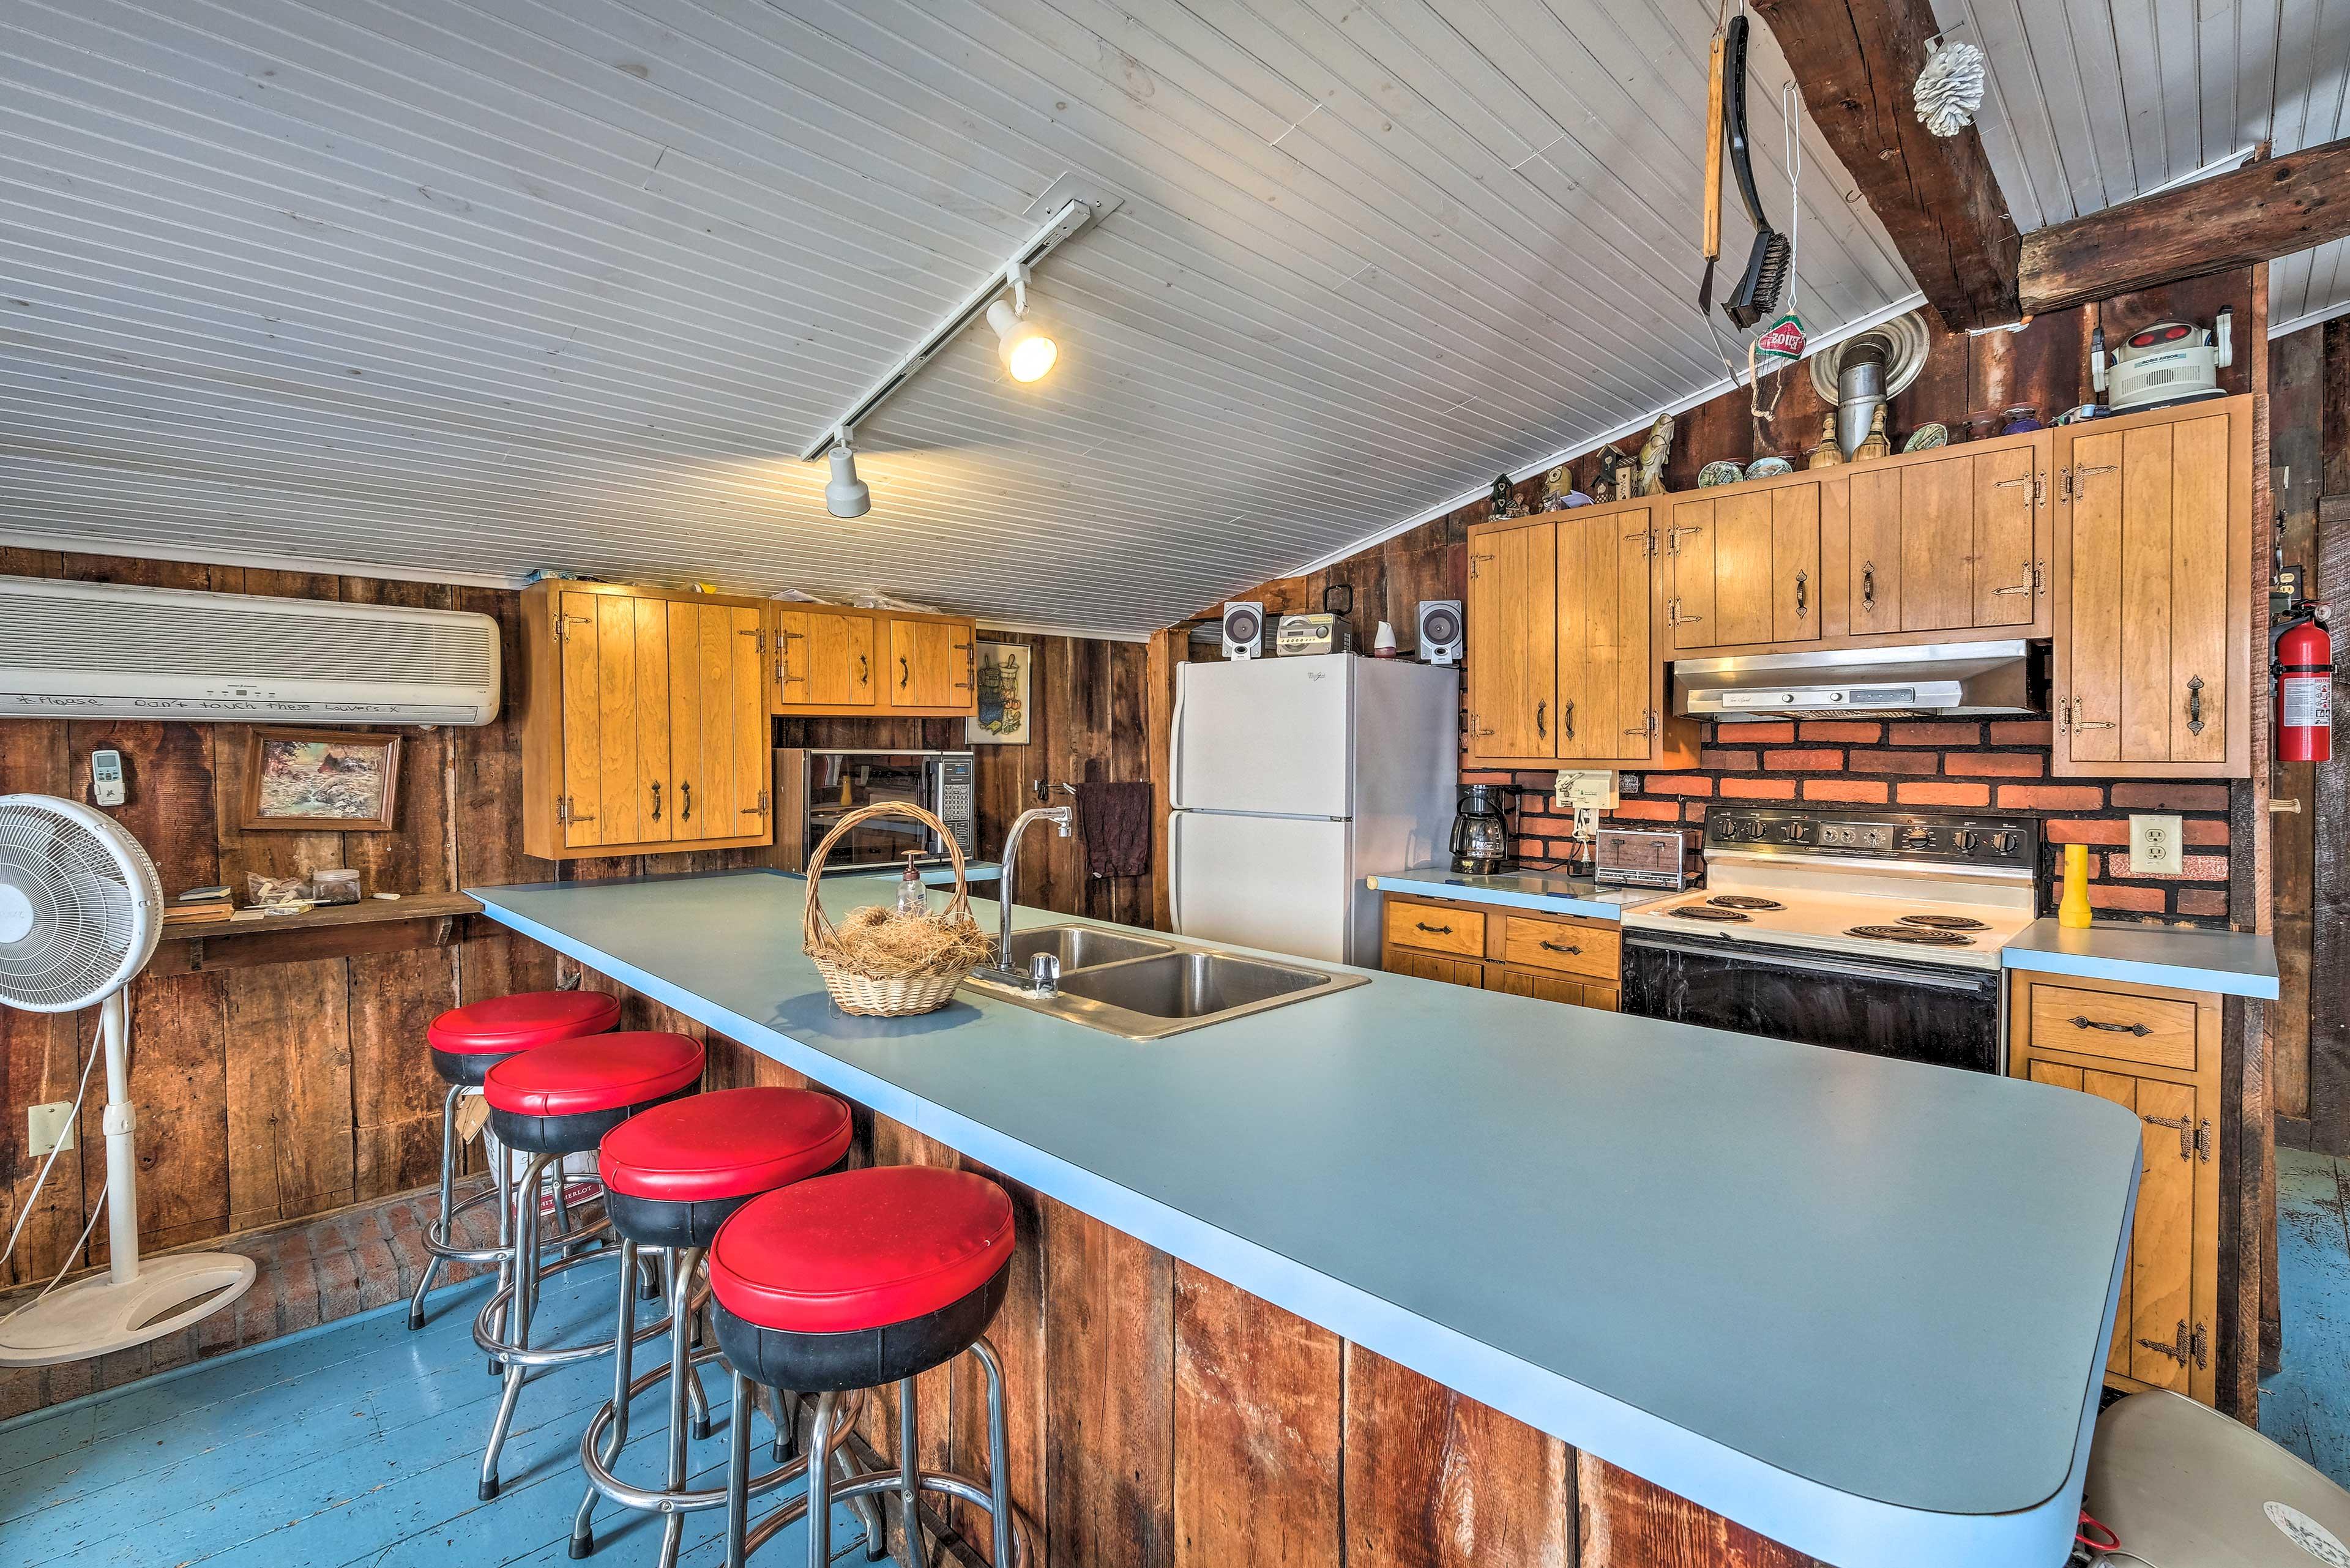 Keep the chef company at the bar-stool breakfast bar!